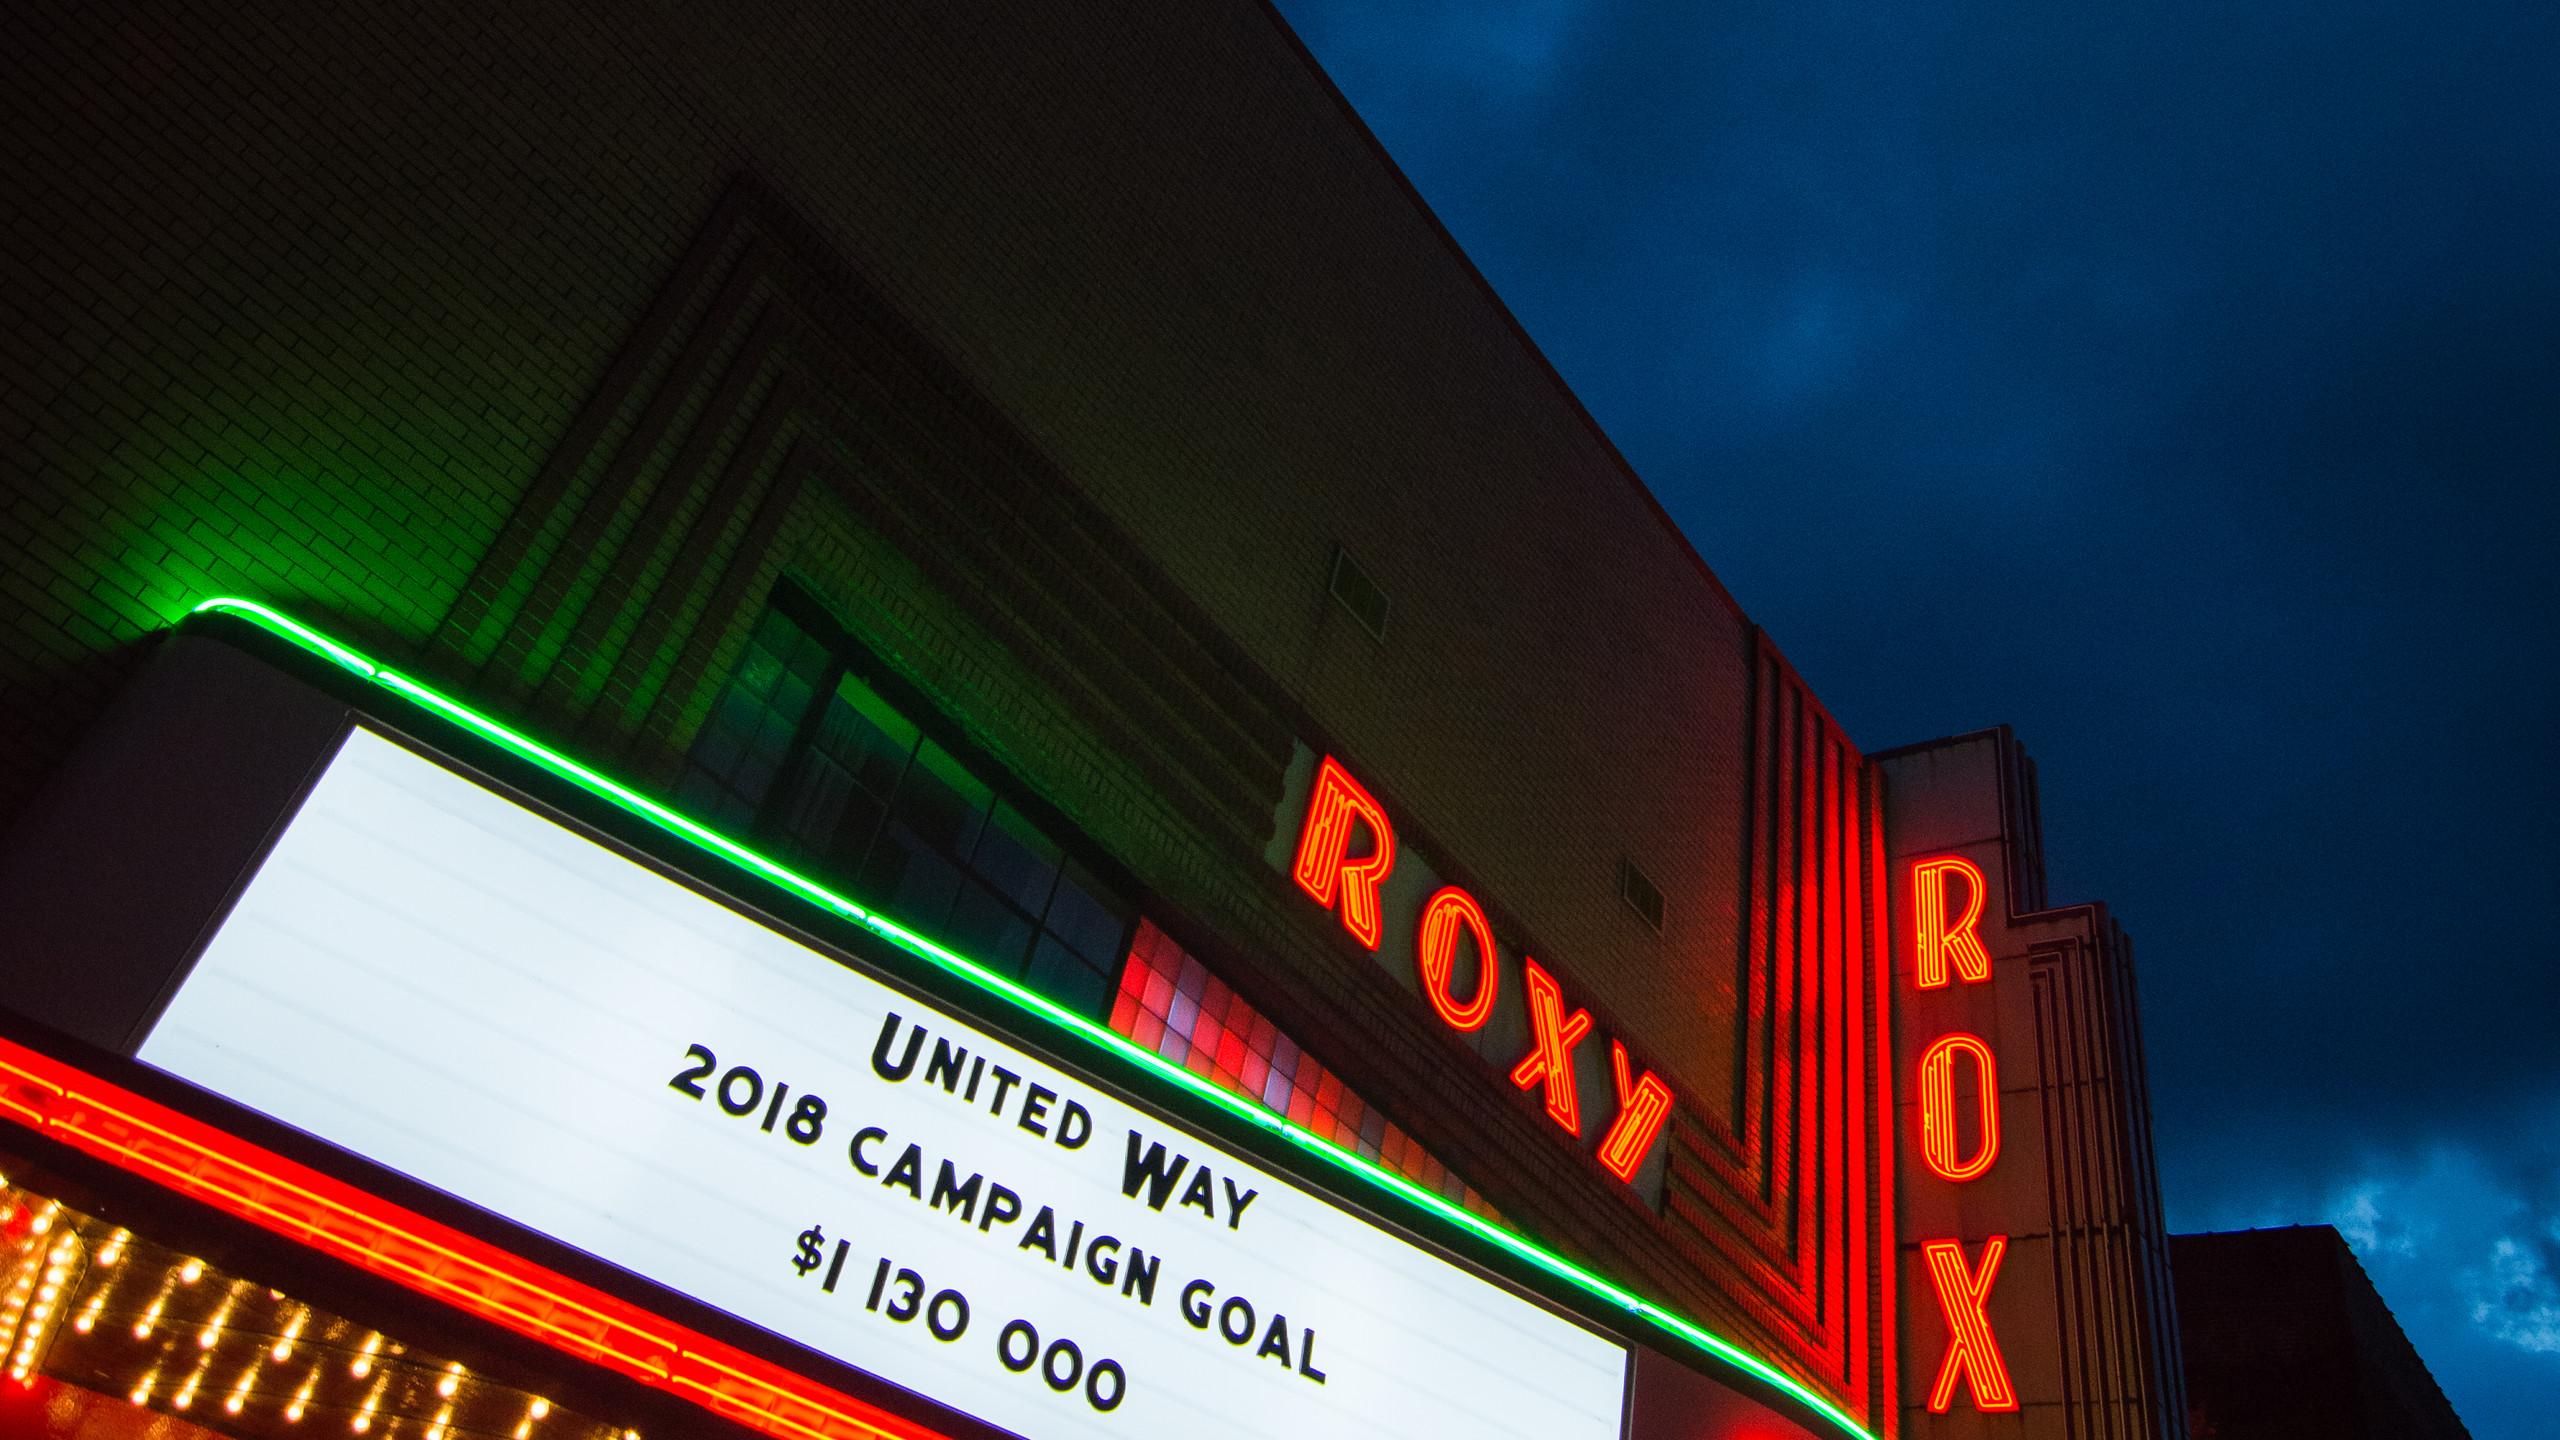 Roxy_United way 2